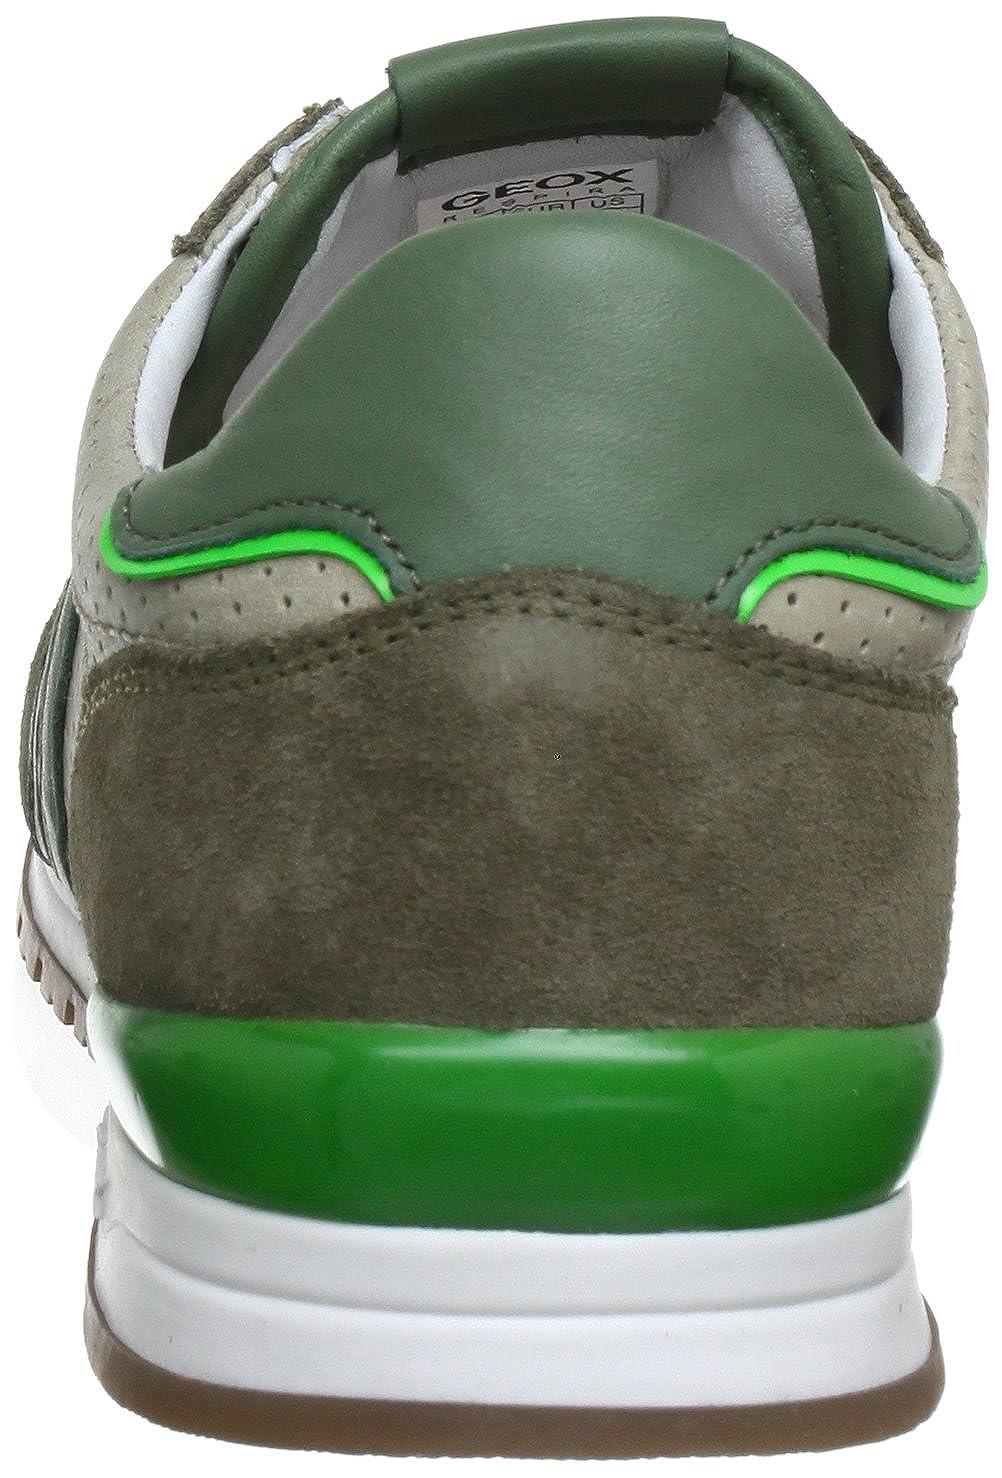 Geox Textil U Speed P MSPEED4 Zapatillas de Deporte para